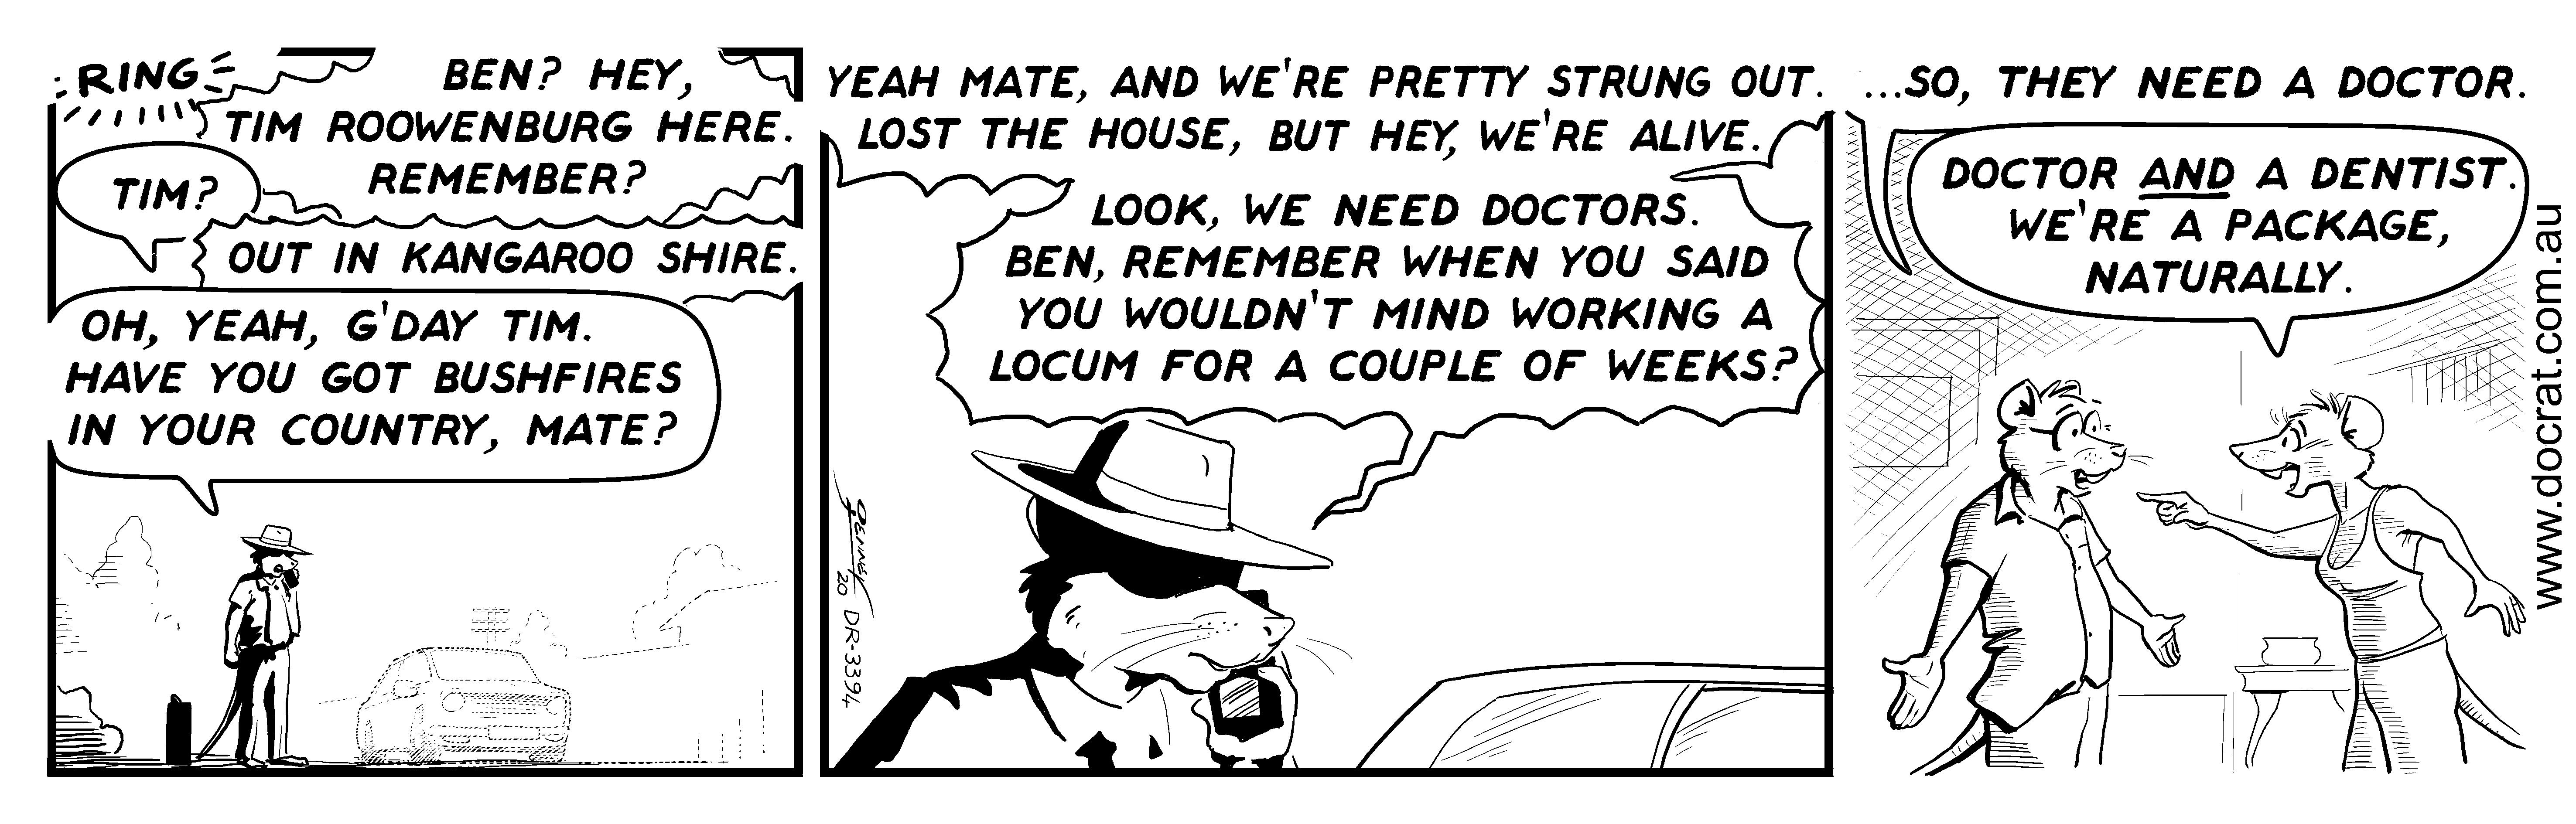 20200116